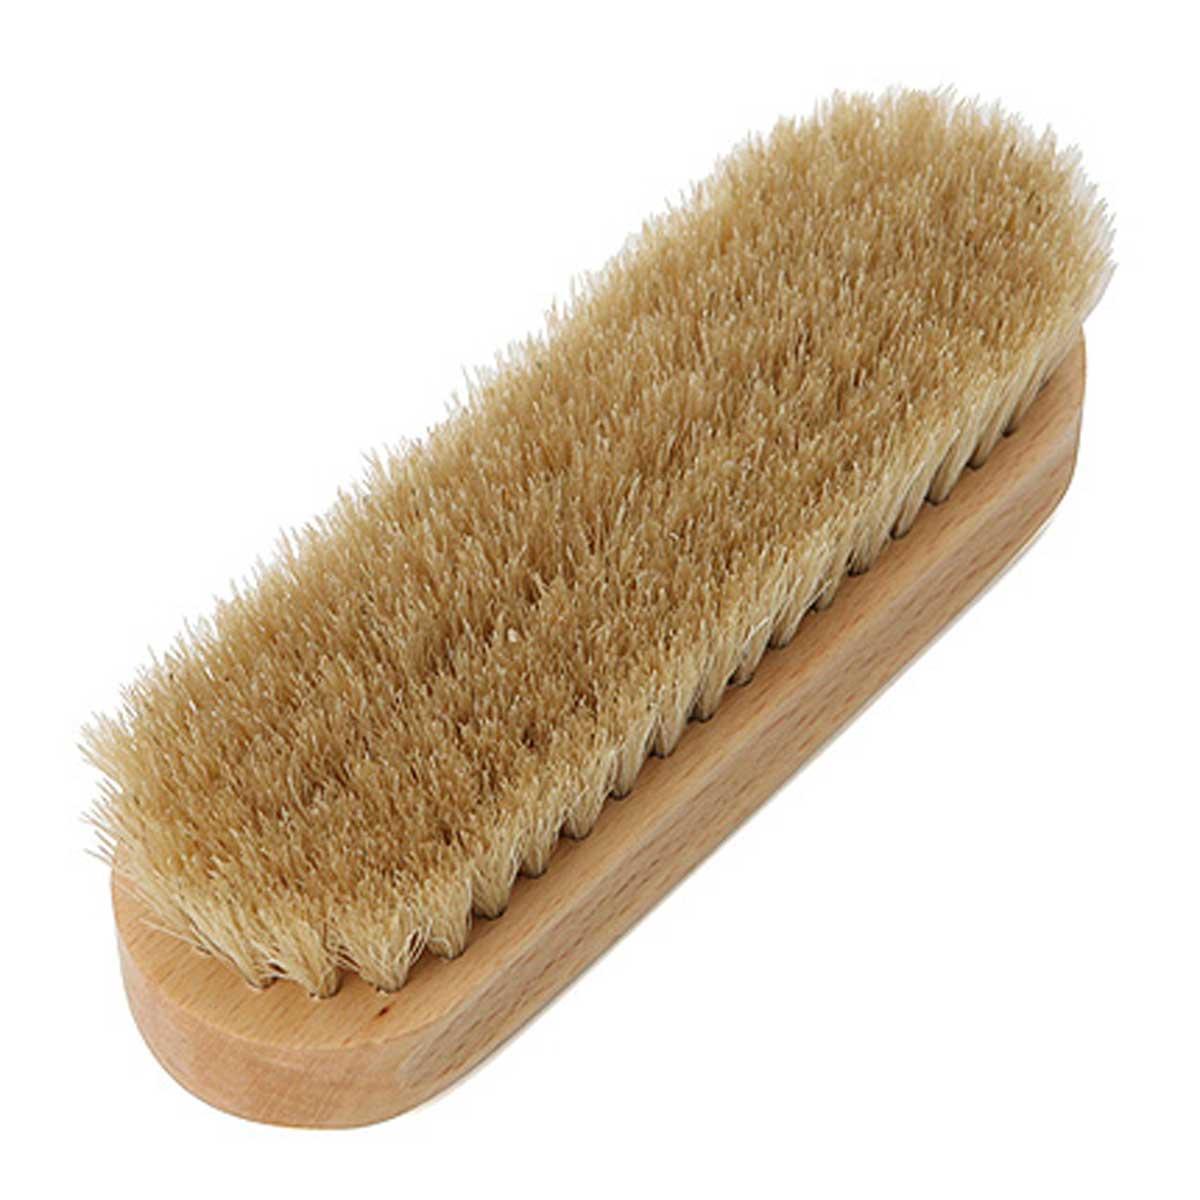 DASCO ダスコ ホースヘアブラシ(スモール)埃払いや、艶出し用の馬毛ブラシ(イギリス製)